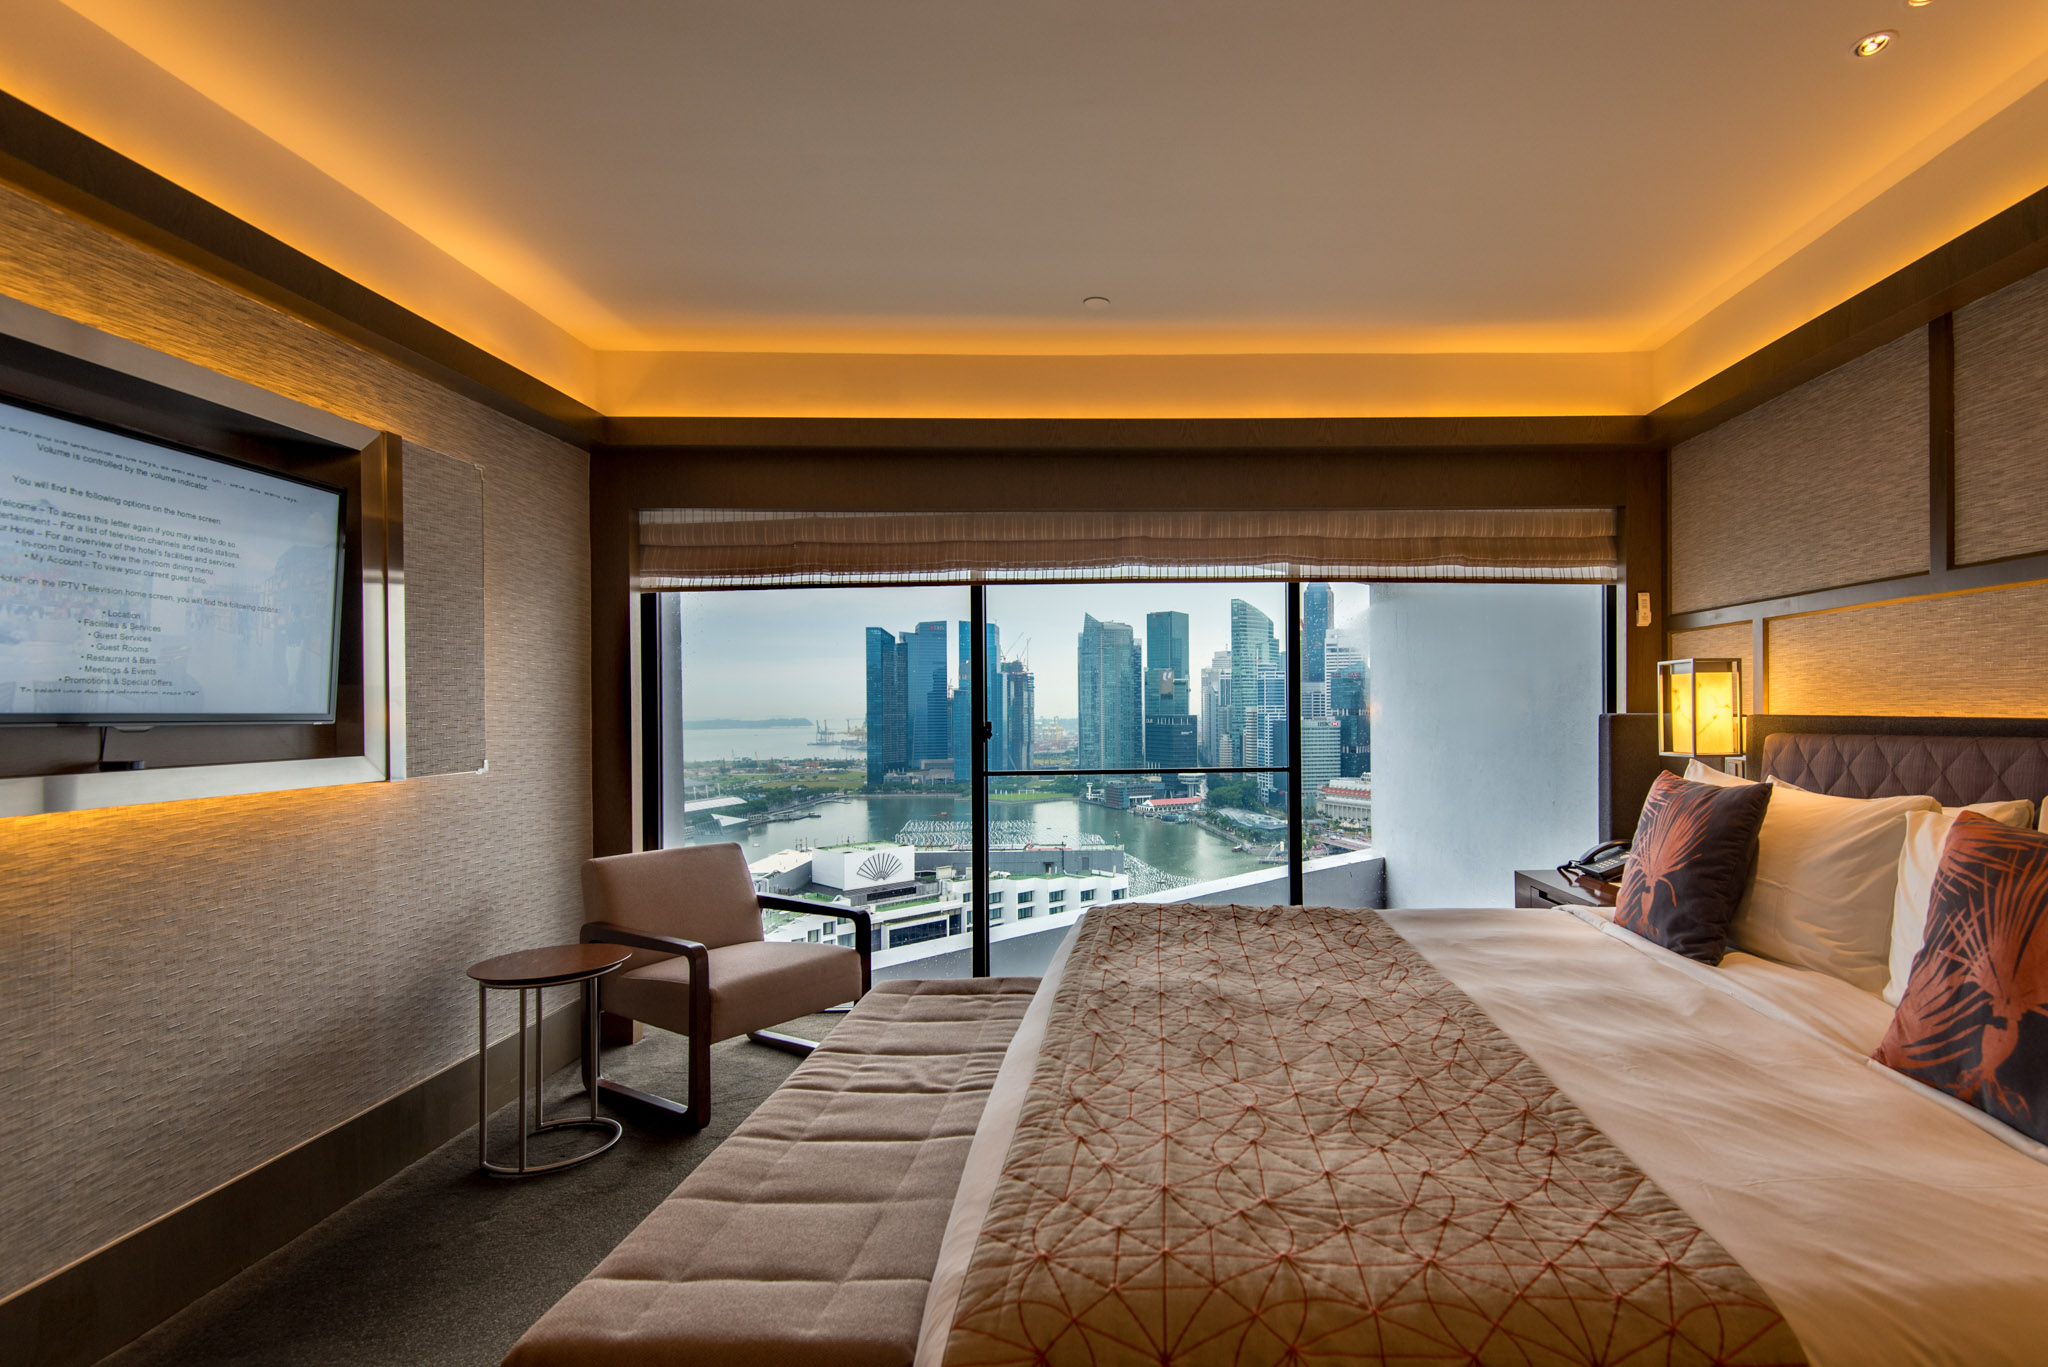 Bedroom    Pacific Harbour Studio - Pan Pacific Singapore